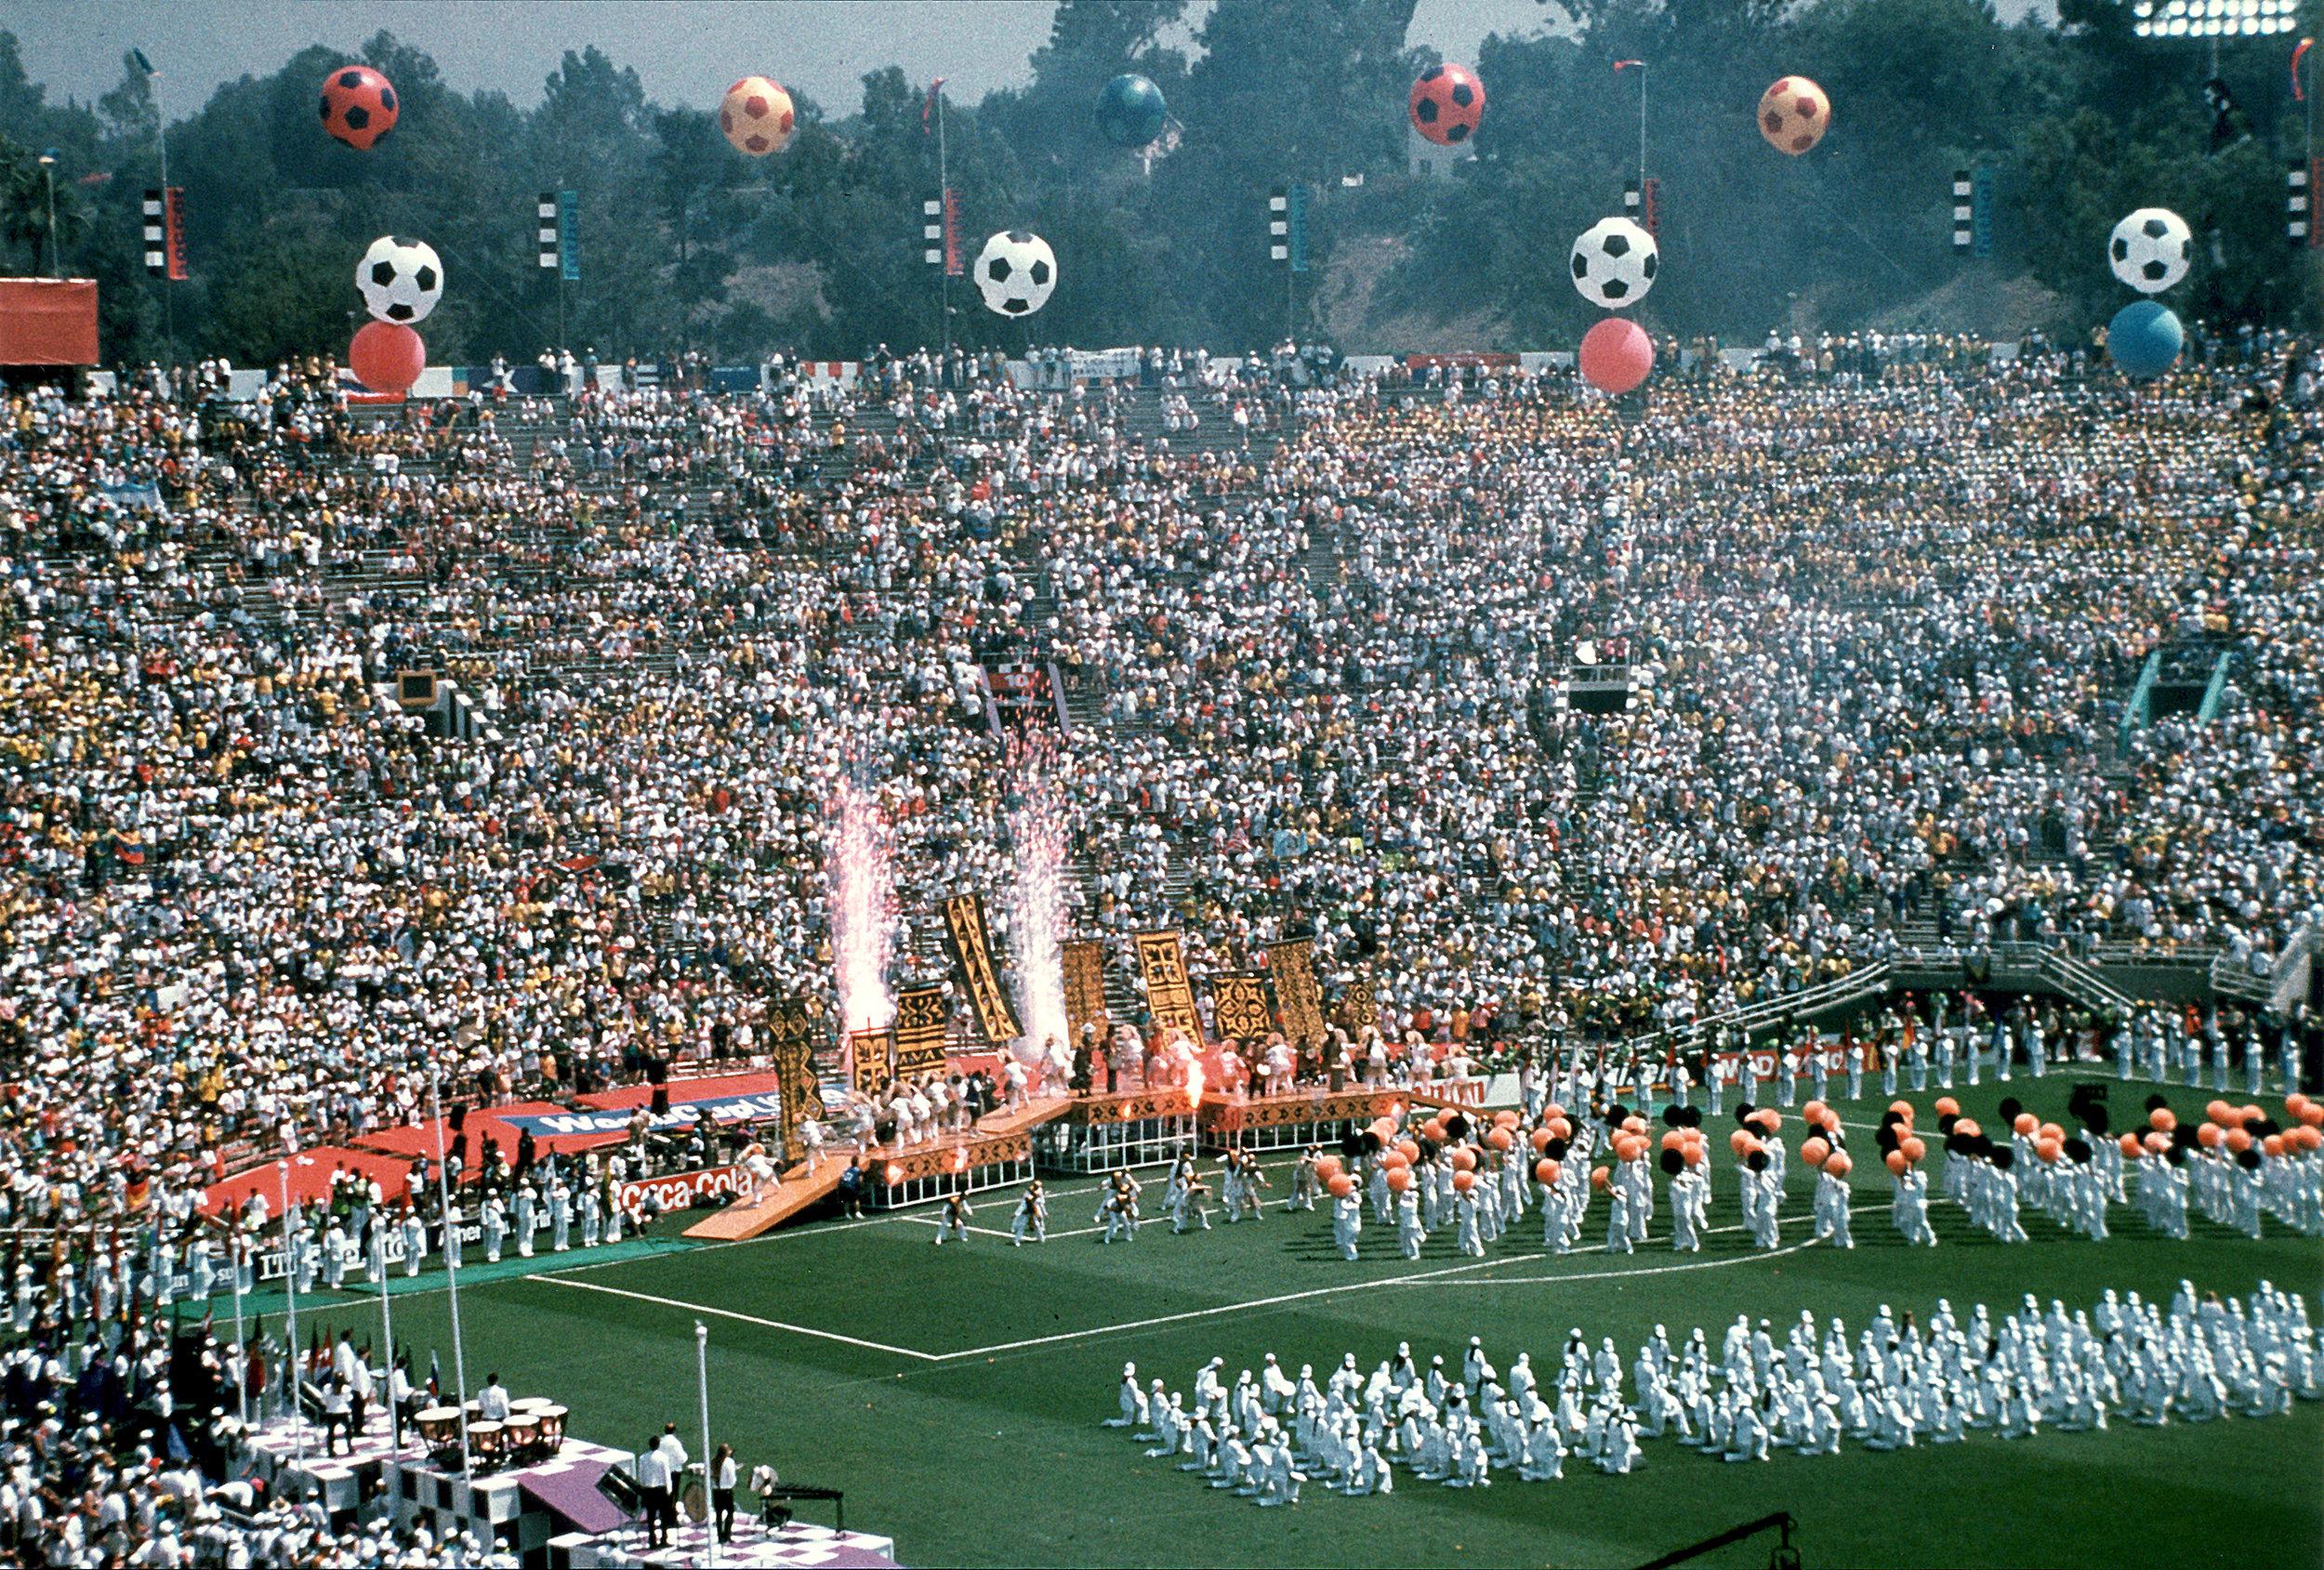 0094_Sports_-_1994_World_Cup_01_(6956398635).jpg